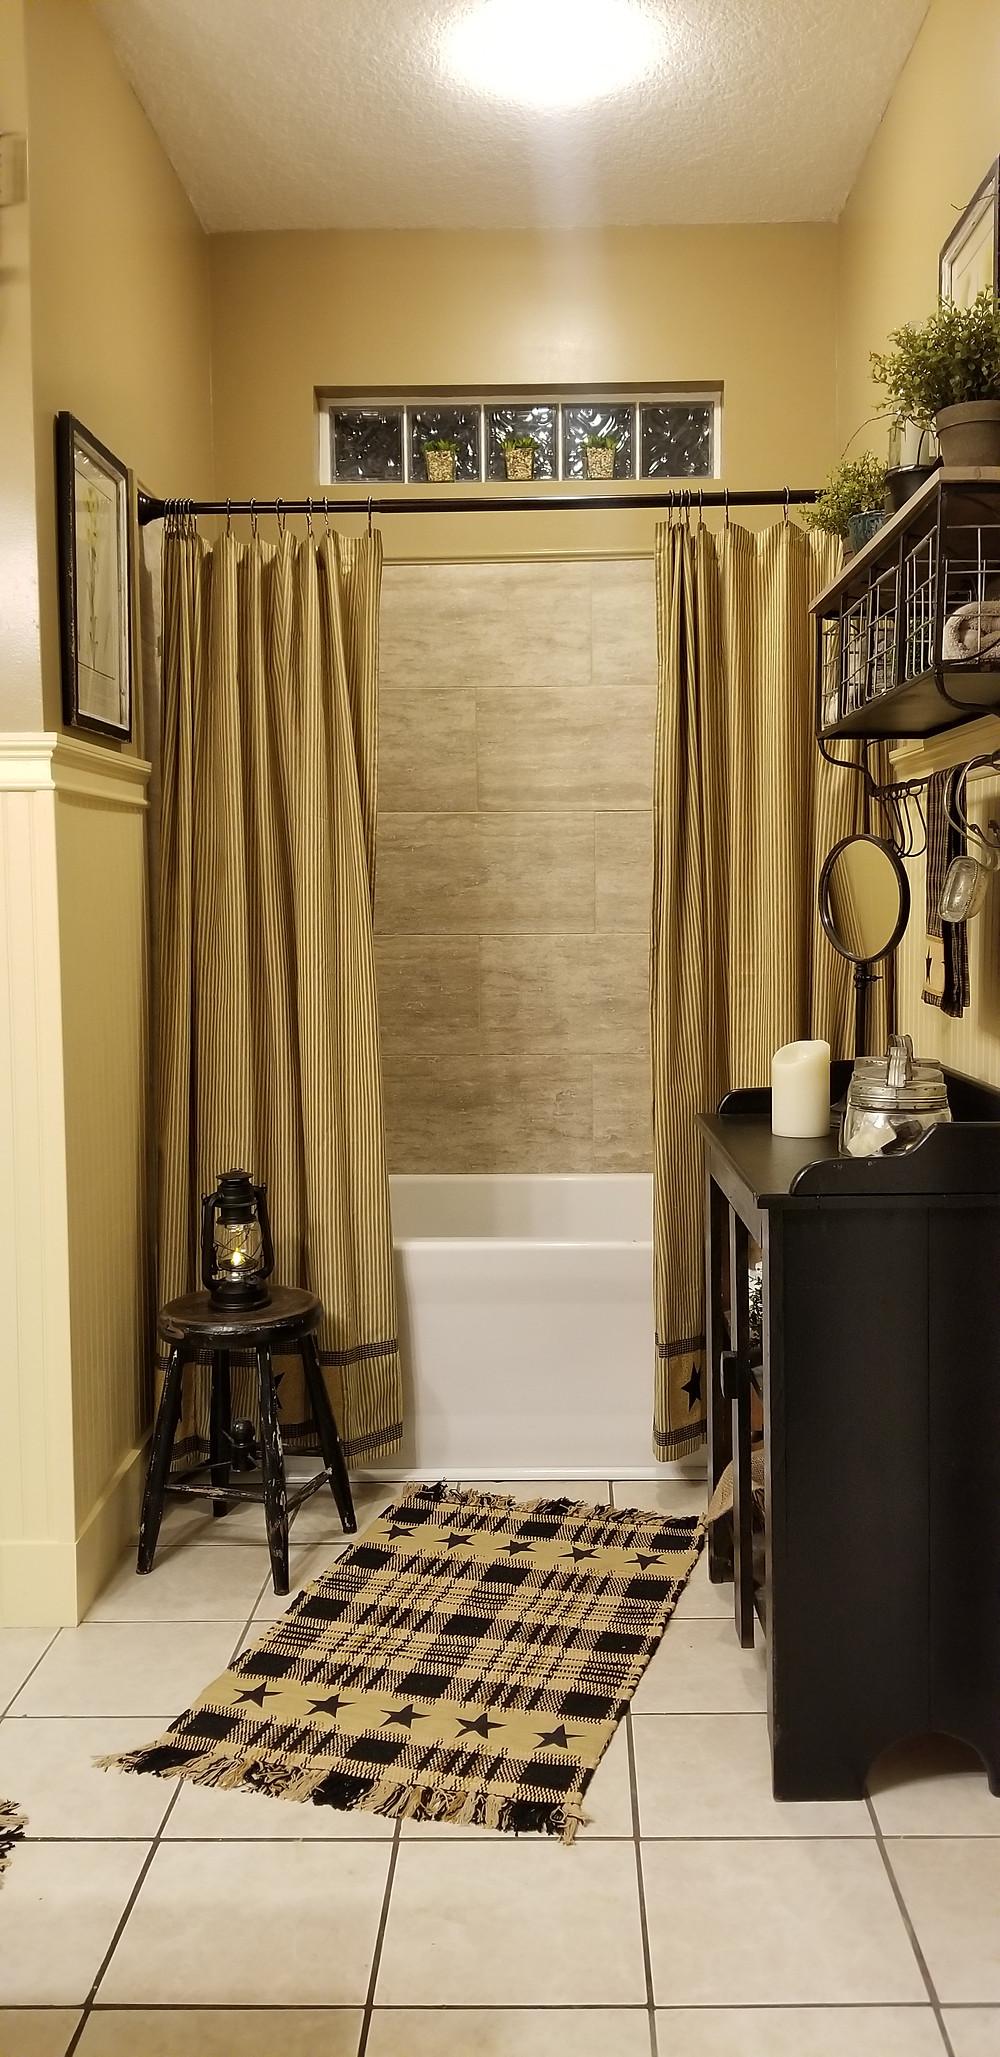 Bathroom Makeover, the Shower